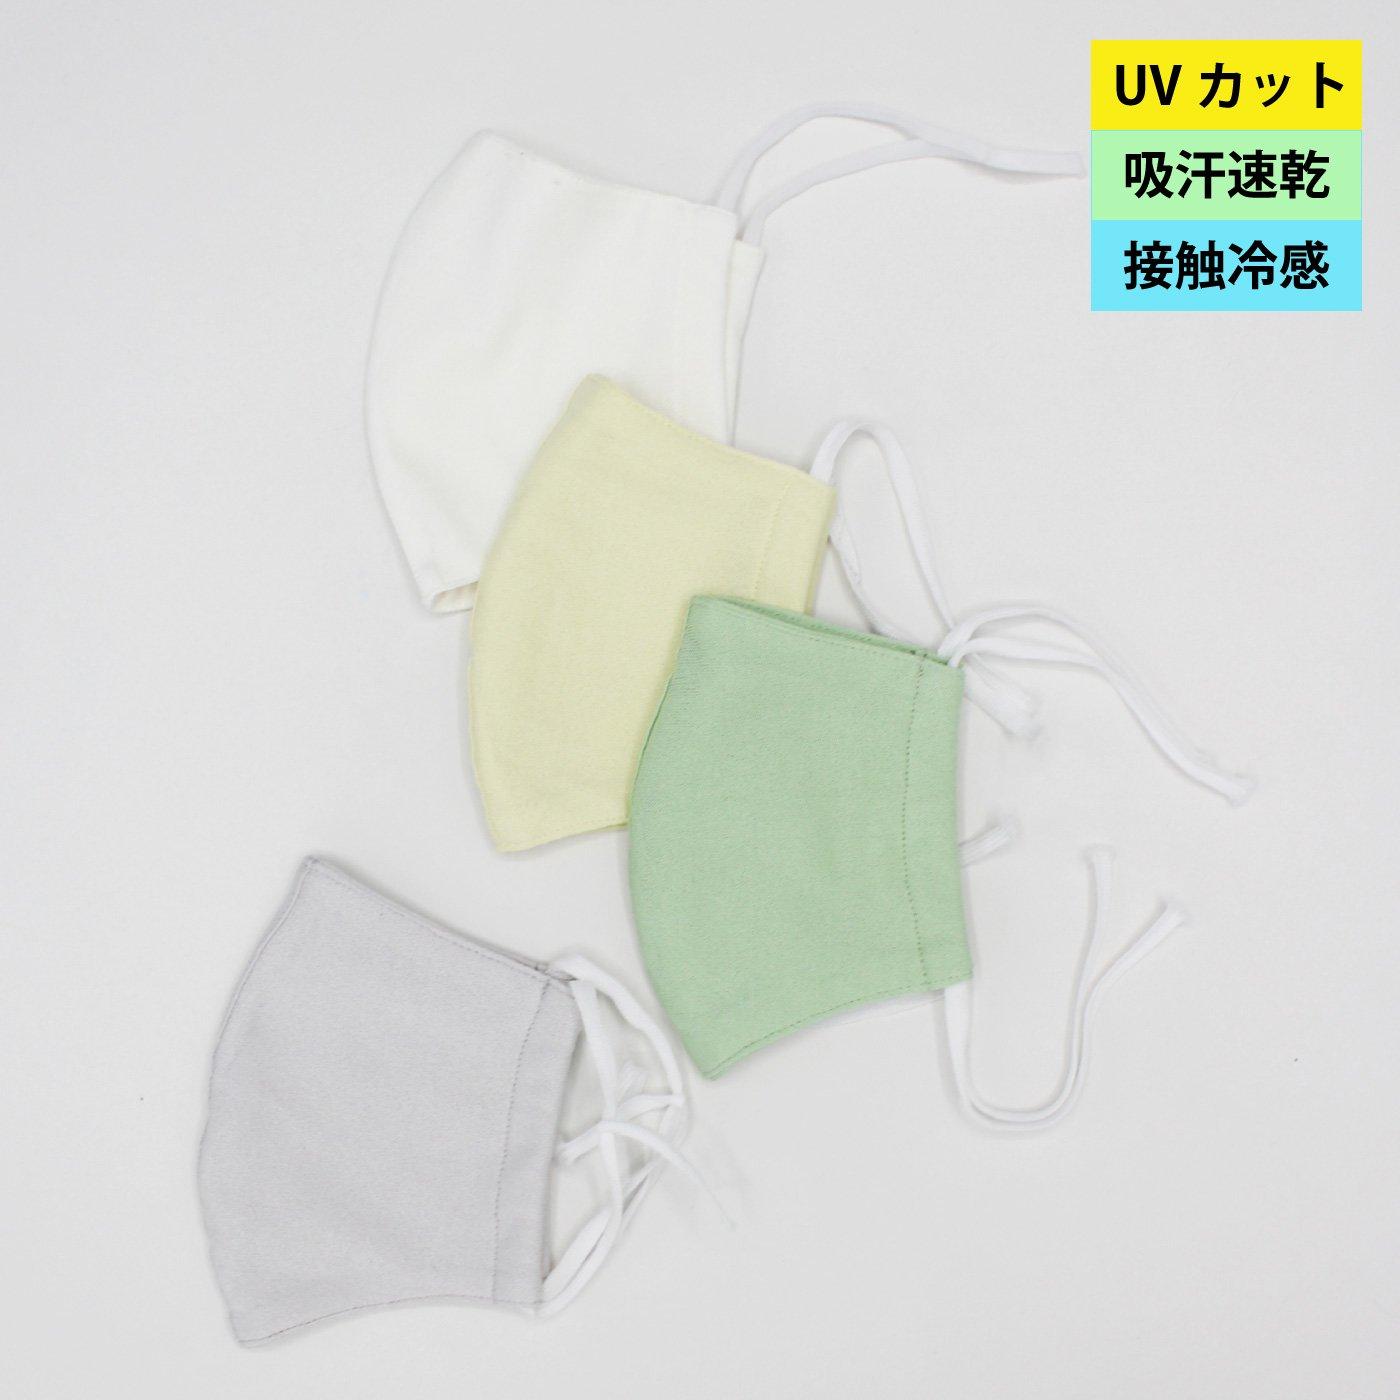 【WEB限定】IEDIT[イディット] UVケア&吸汗速乾と接触冷感で快適な 和紙ブレンド素材で仕上げた国産の布マスク